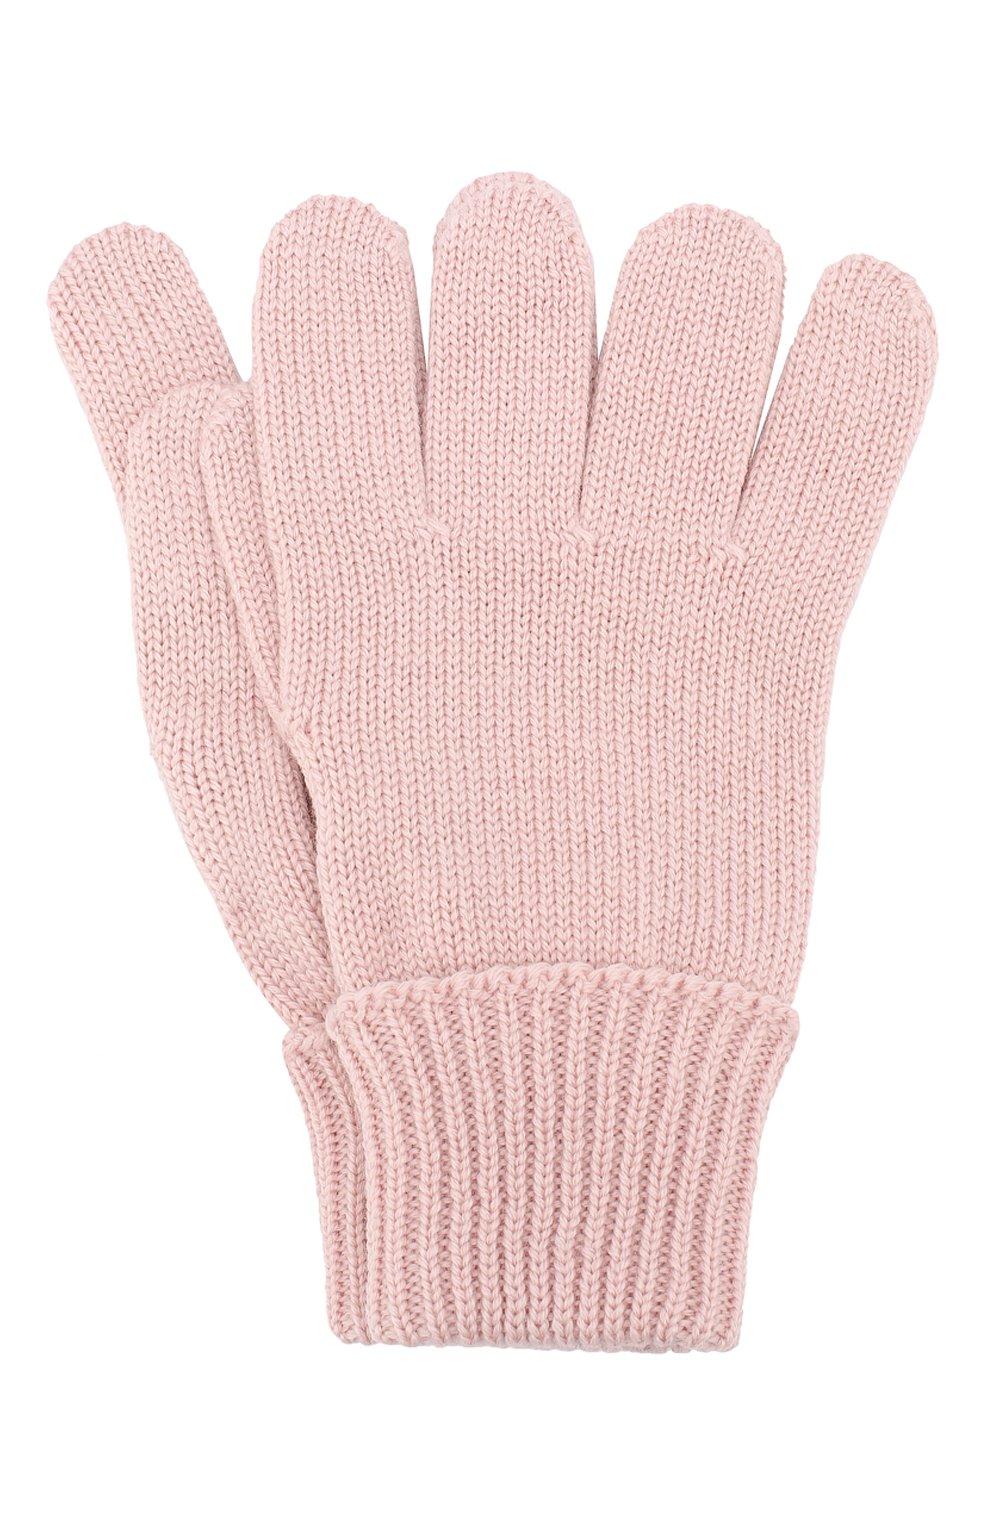 Детские шерстяные перчатки IL TRENINO розового цвета, арт. 19 5059/E0 | Фото 1